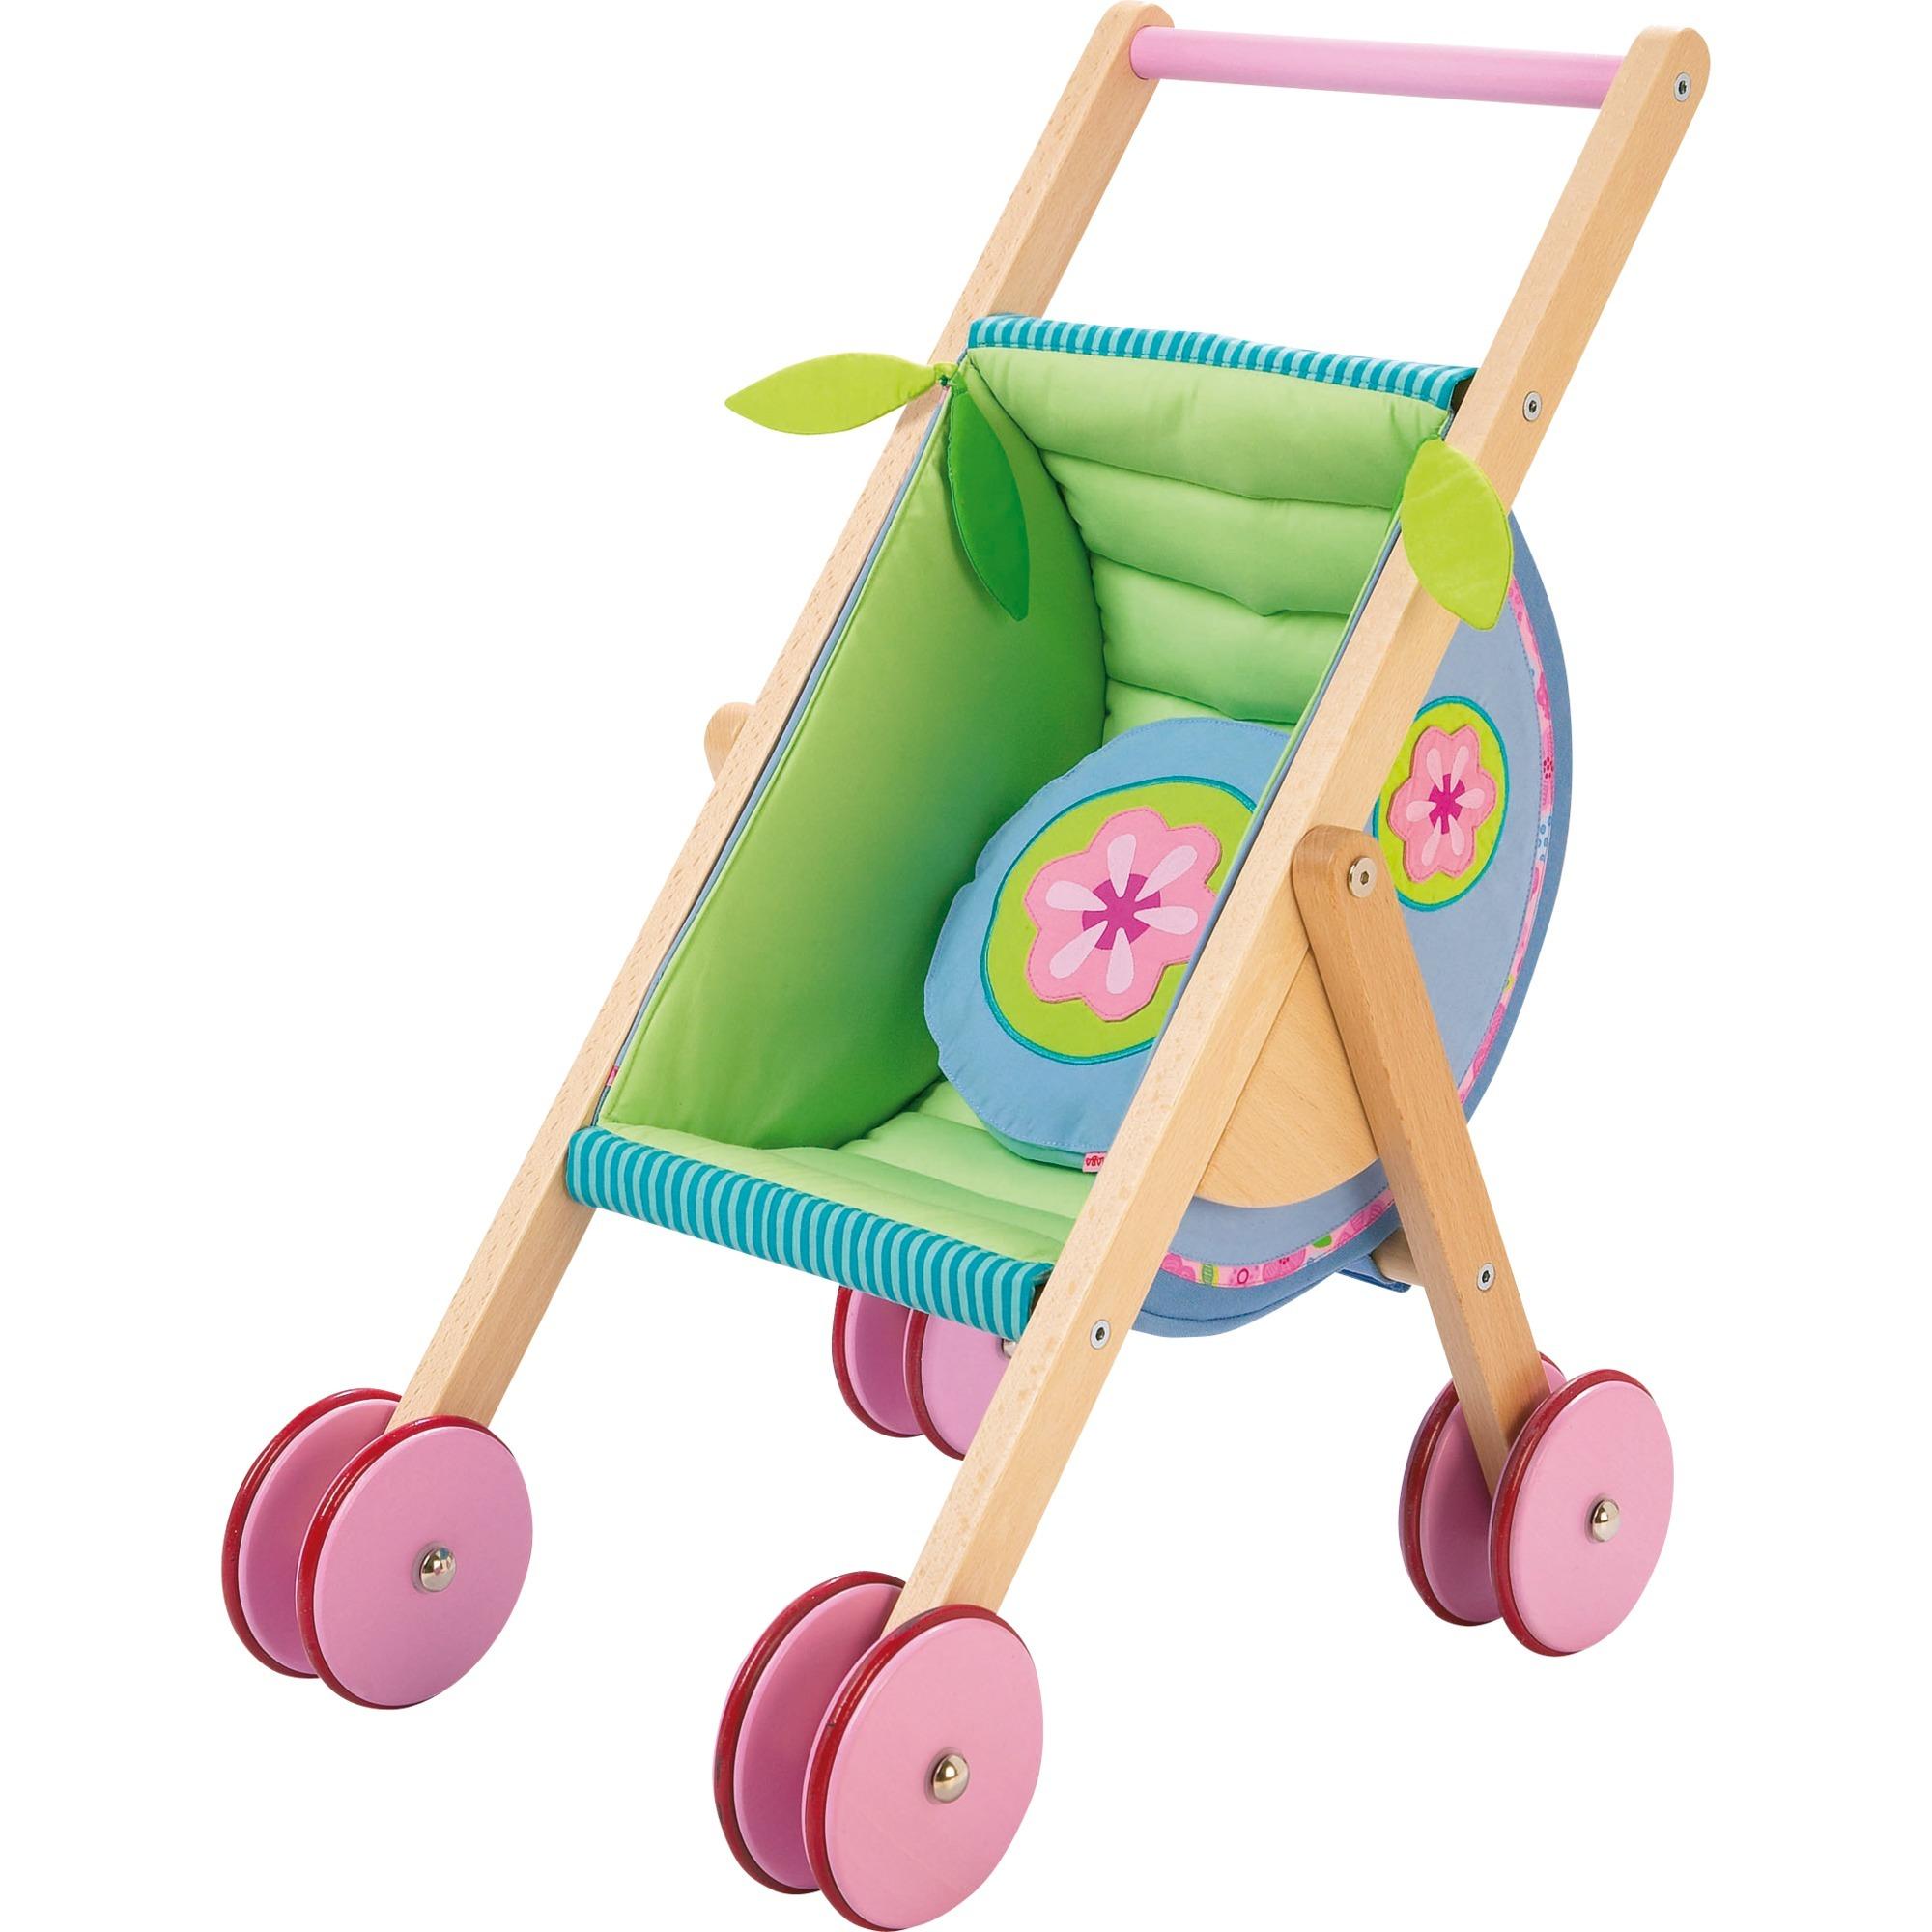 003740 Silla de paseo de juguete, Cochecitos de muñecos